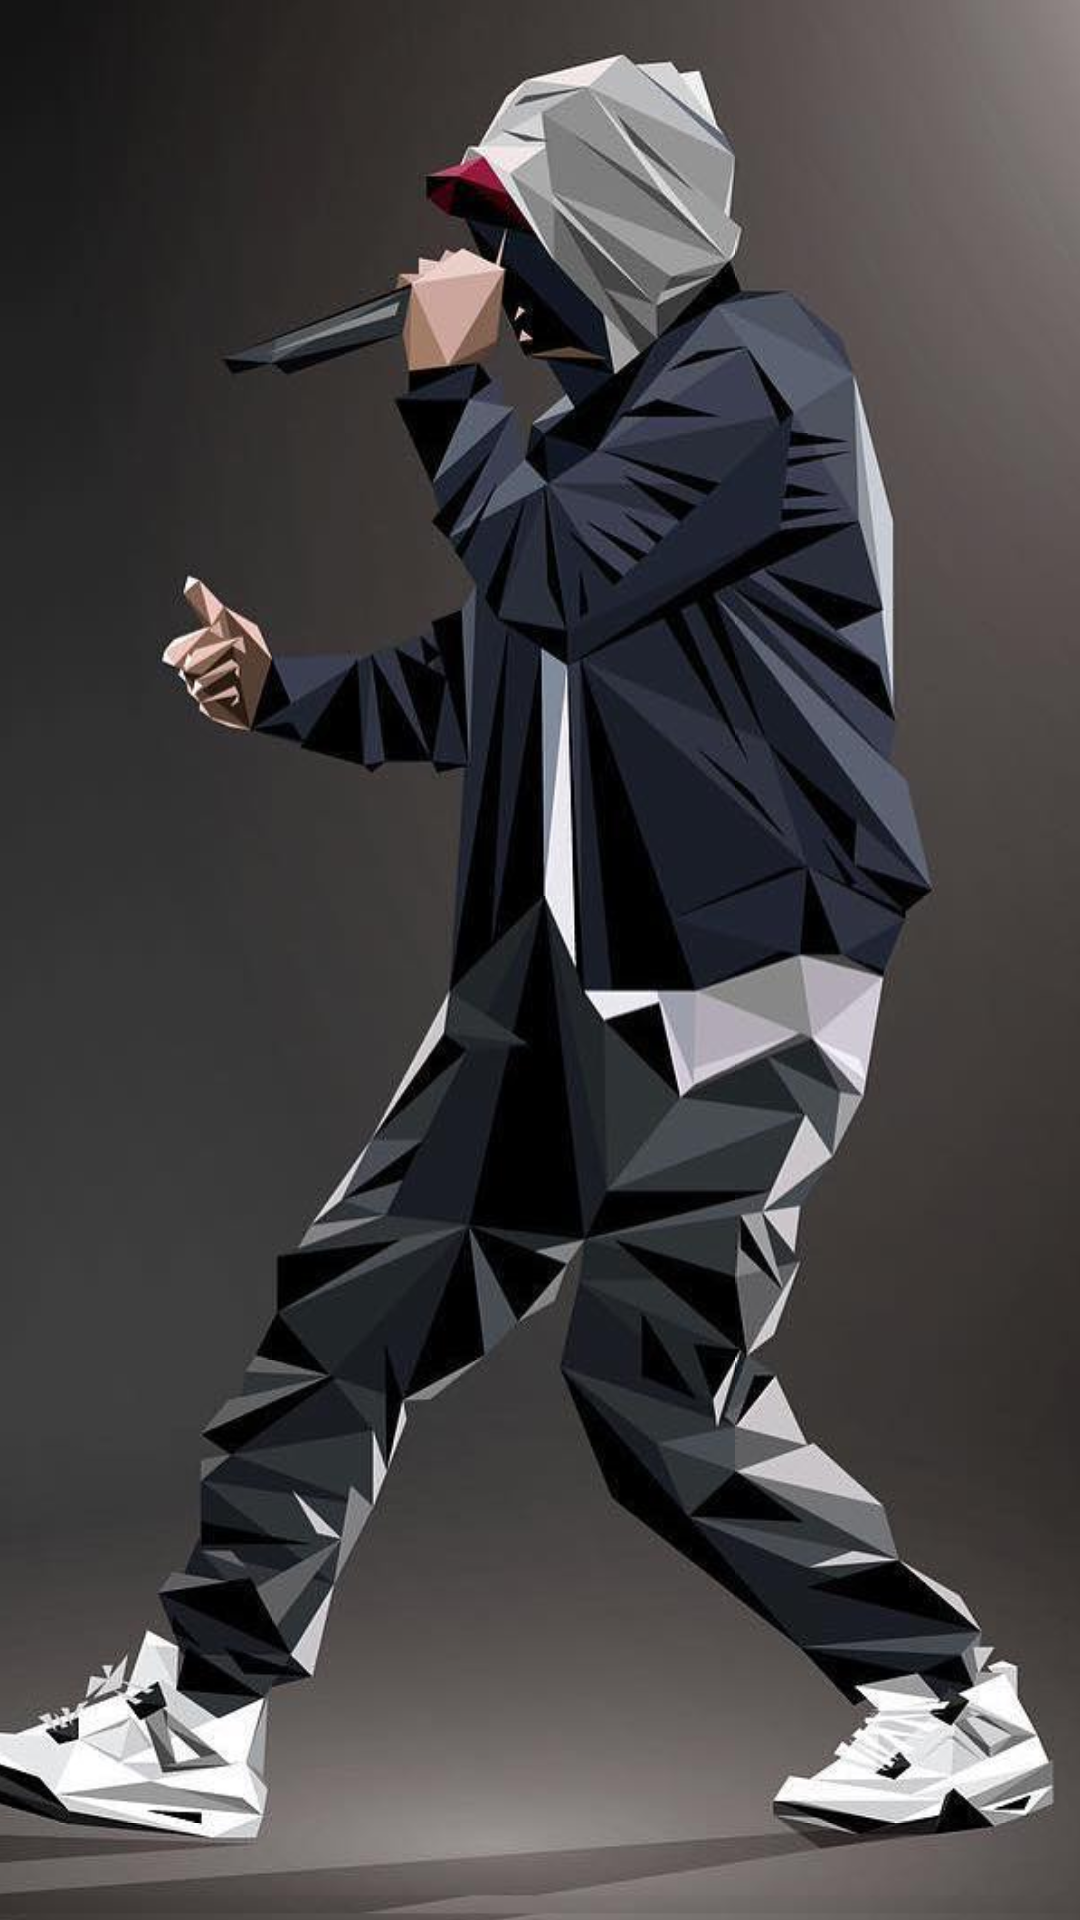 Download Rap God Eminem Wallpaper Mobile On High Quality Wallpaper On Hdwallpaper9 Com Iphone Eminem Wallpapers Eminem Wallpaper Iphone Eminem Hd Wallpapers